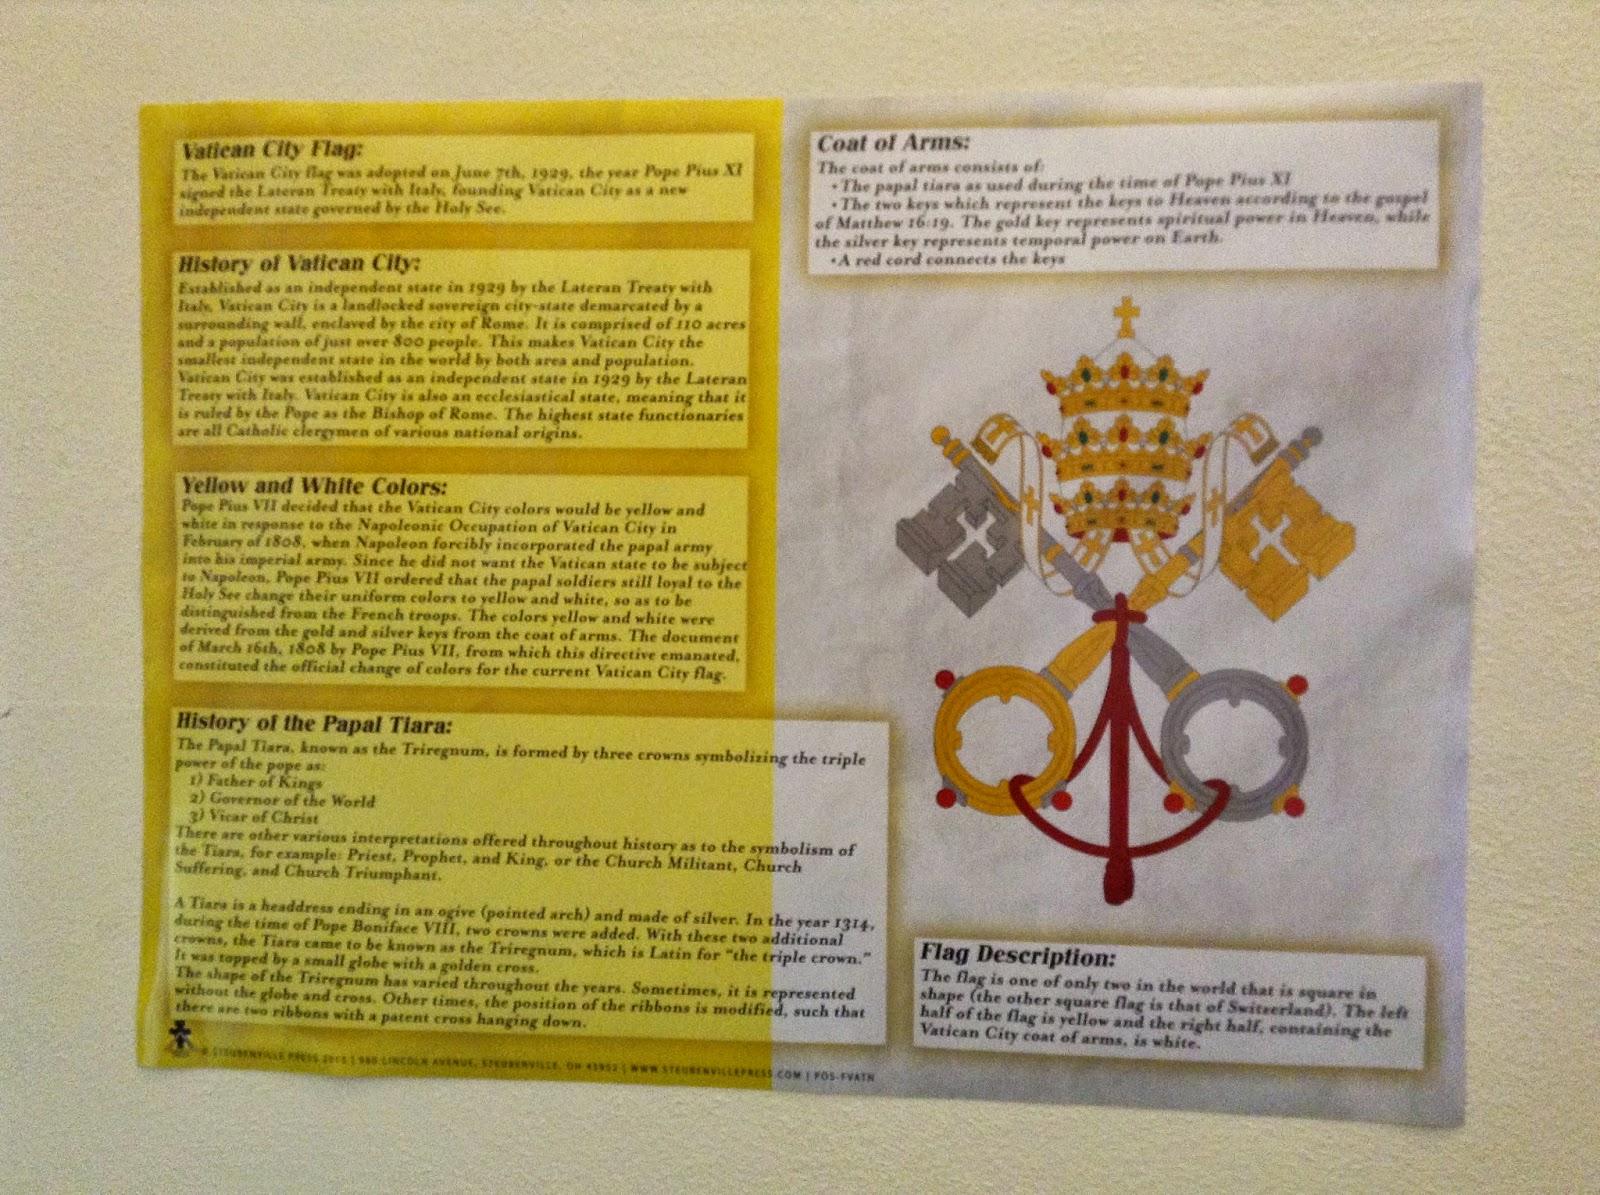 http://www.steubenvillepress.com/vatican-flag-explained-poster/